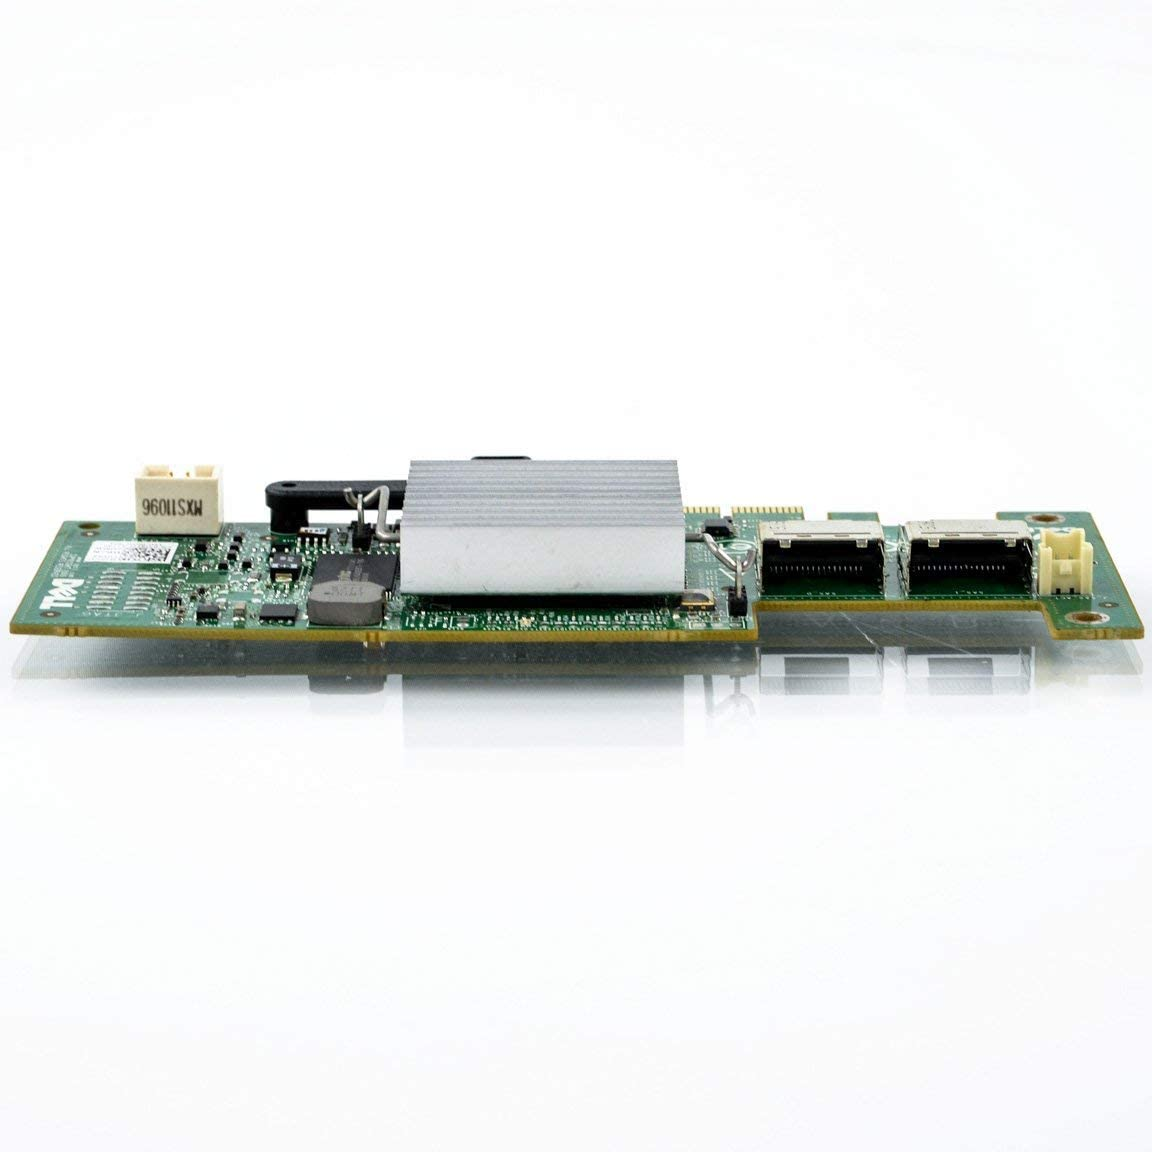 Renewed Dell Perc H200 Integrated Sas Pci-e 2.0 Raid Controller for Dell Servers H215j